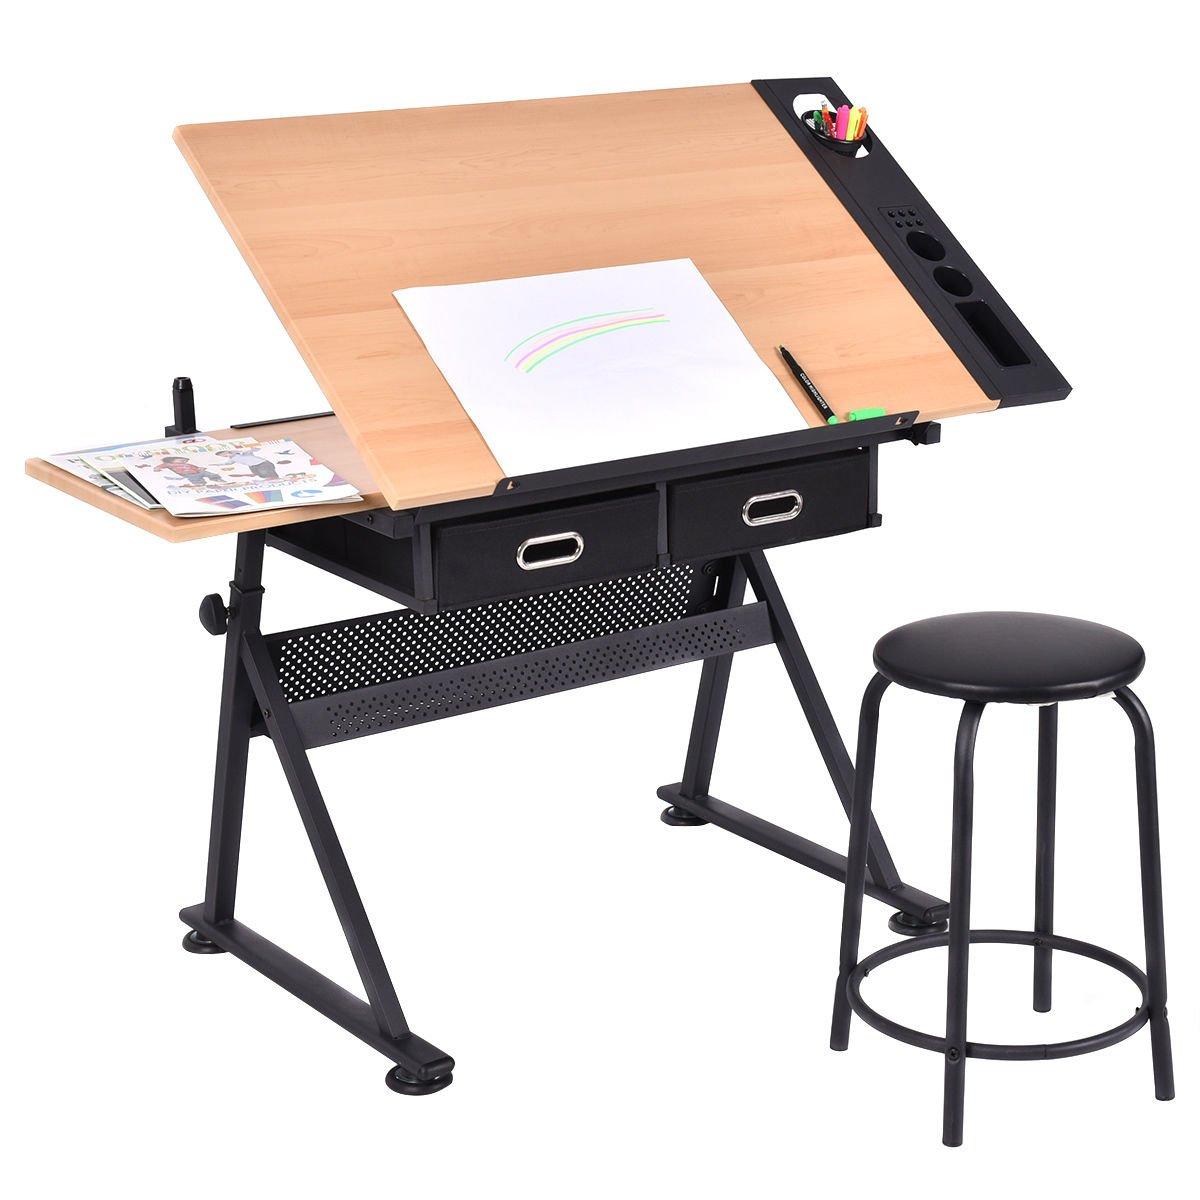 Strange Buy Tangkula Drafting Desk Drawing Table Adjustable With Creativecarmelina Interior Chair Design Creativecarmelinacom